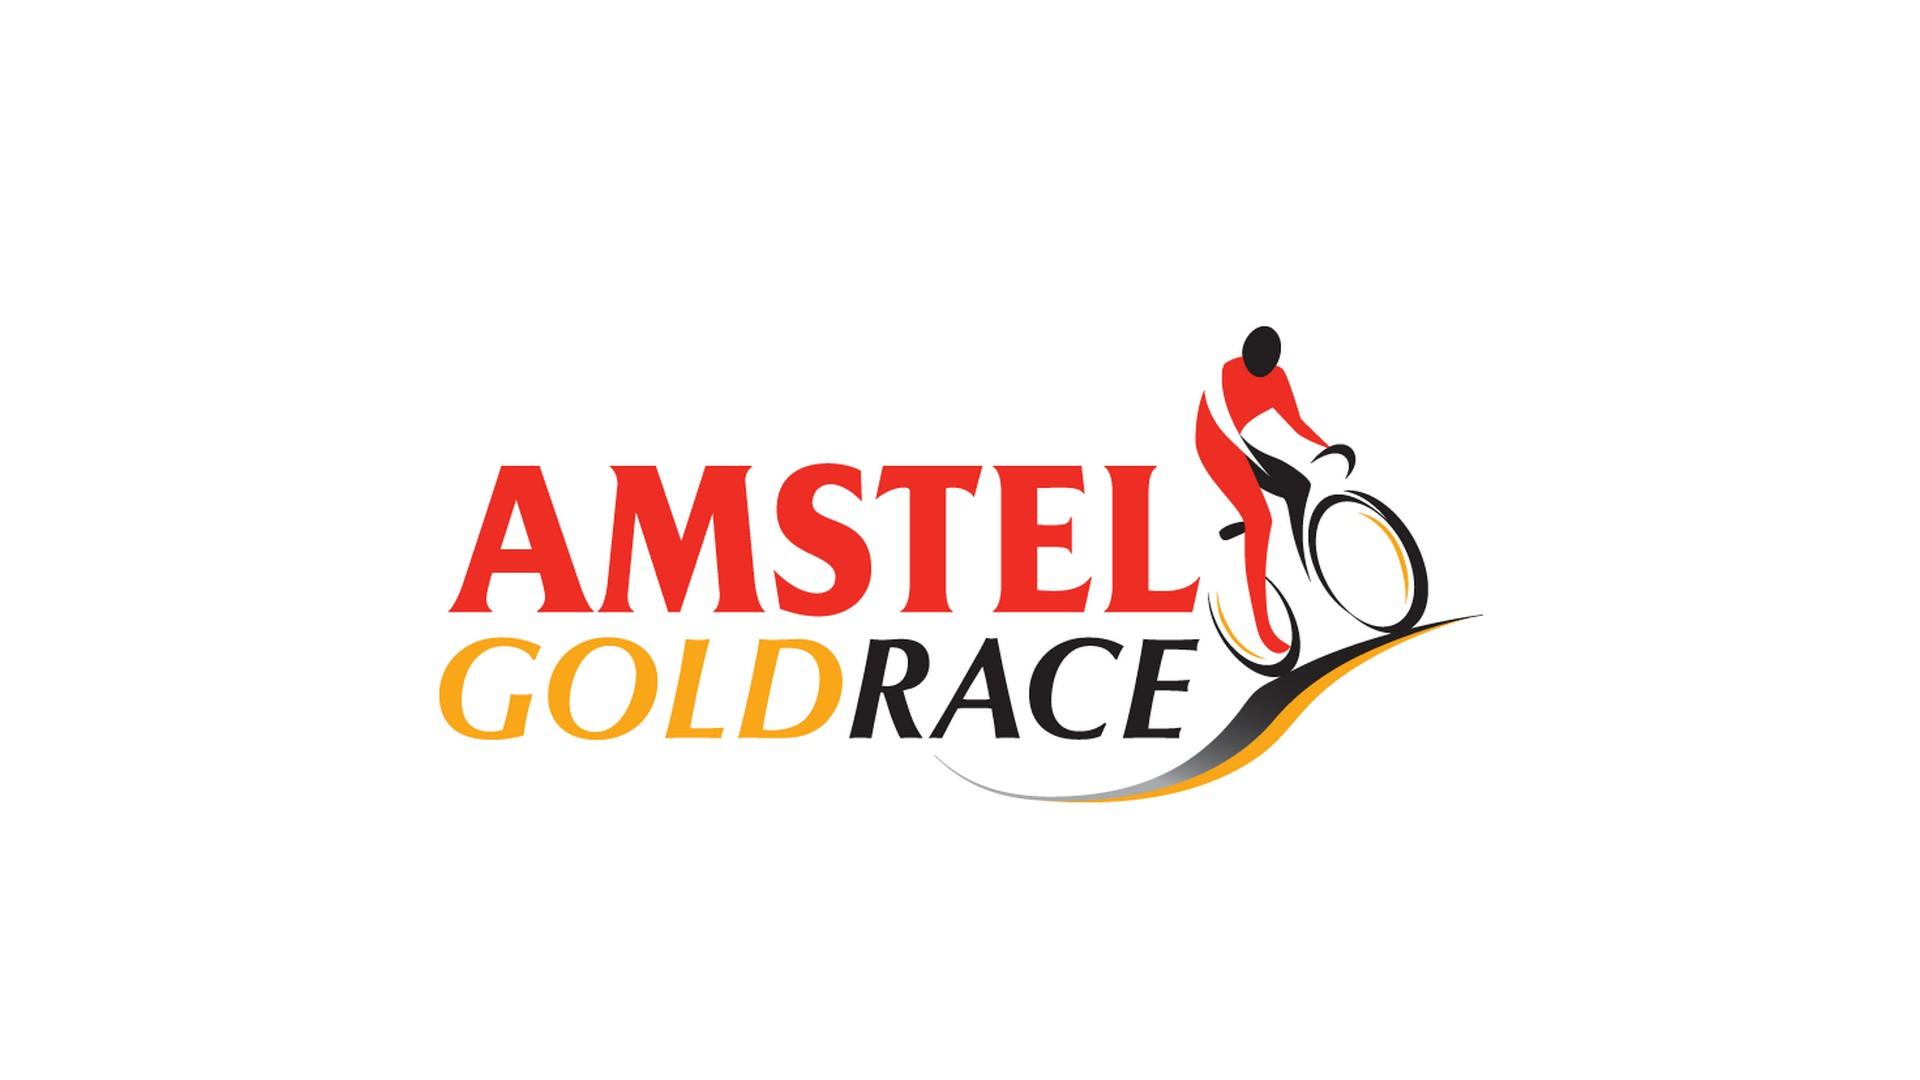 Amstel Gold Race (2) logo